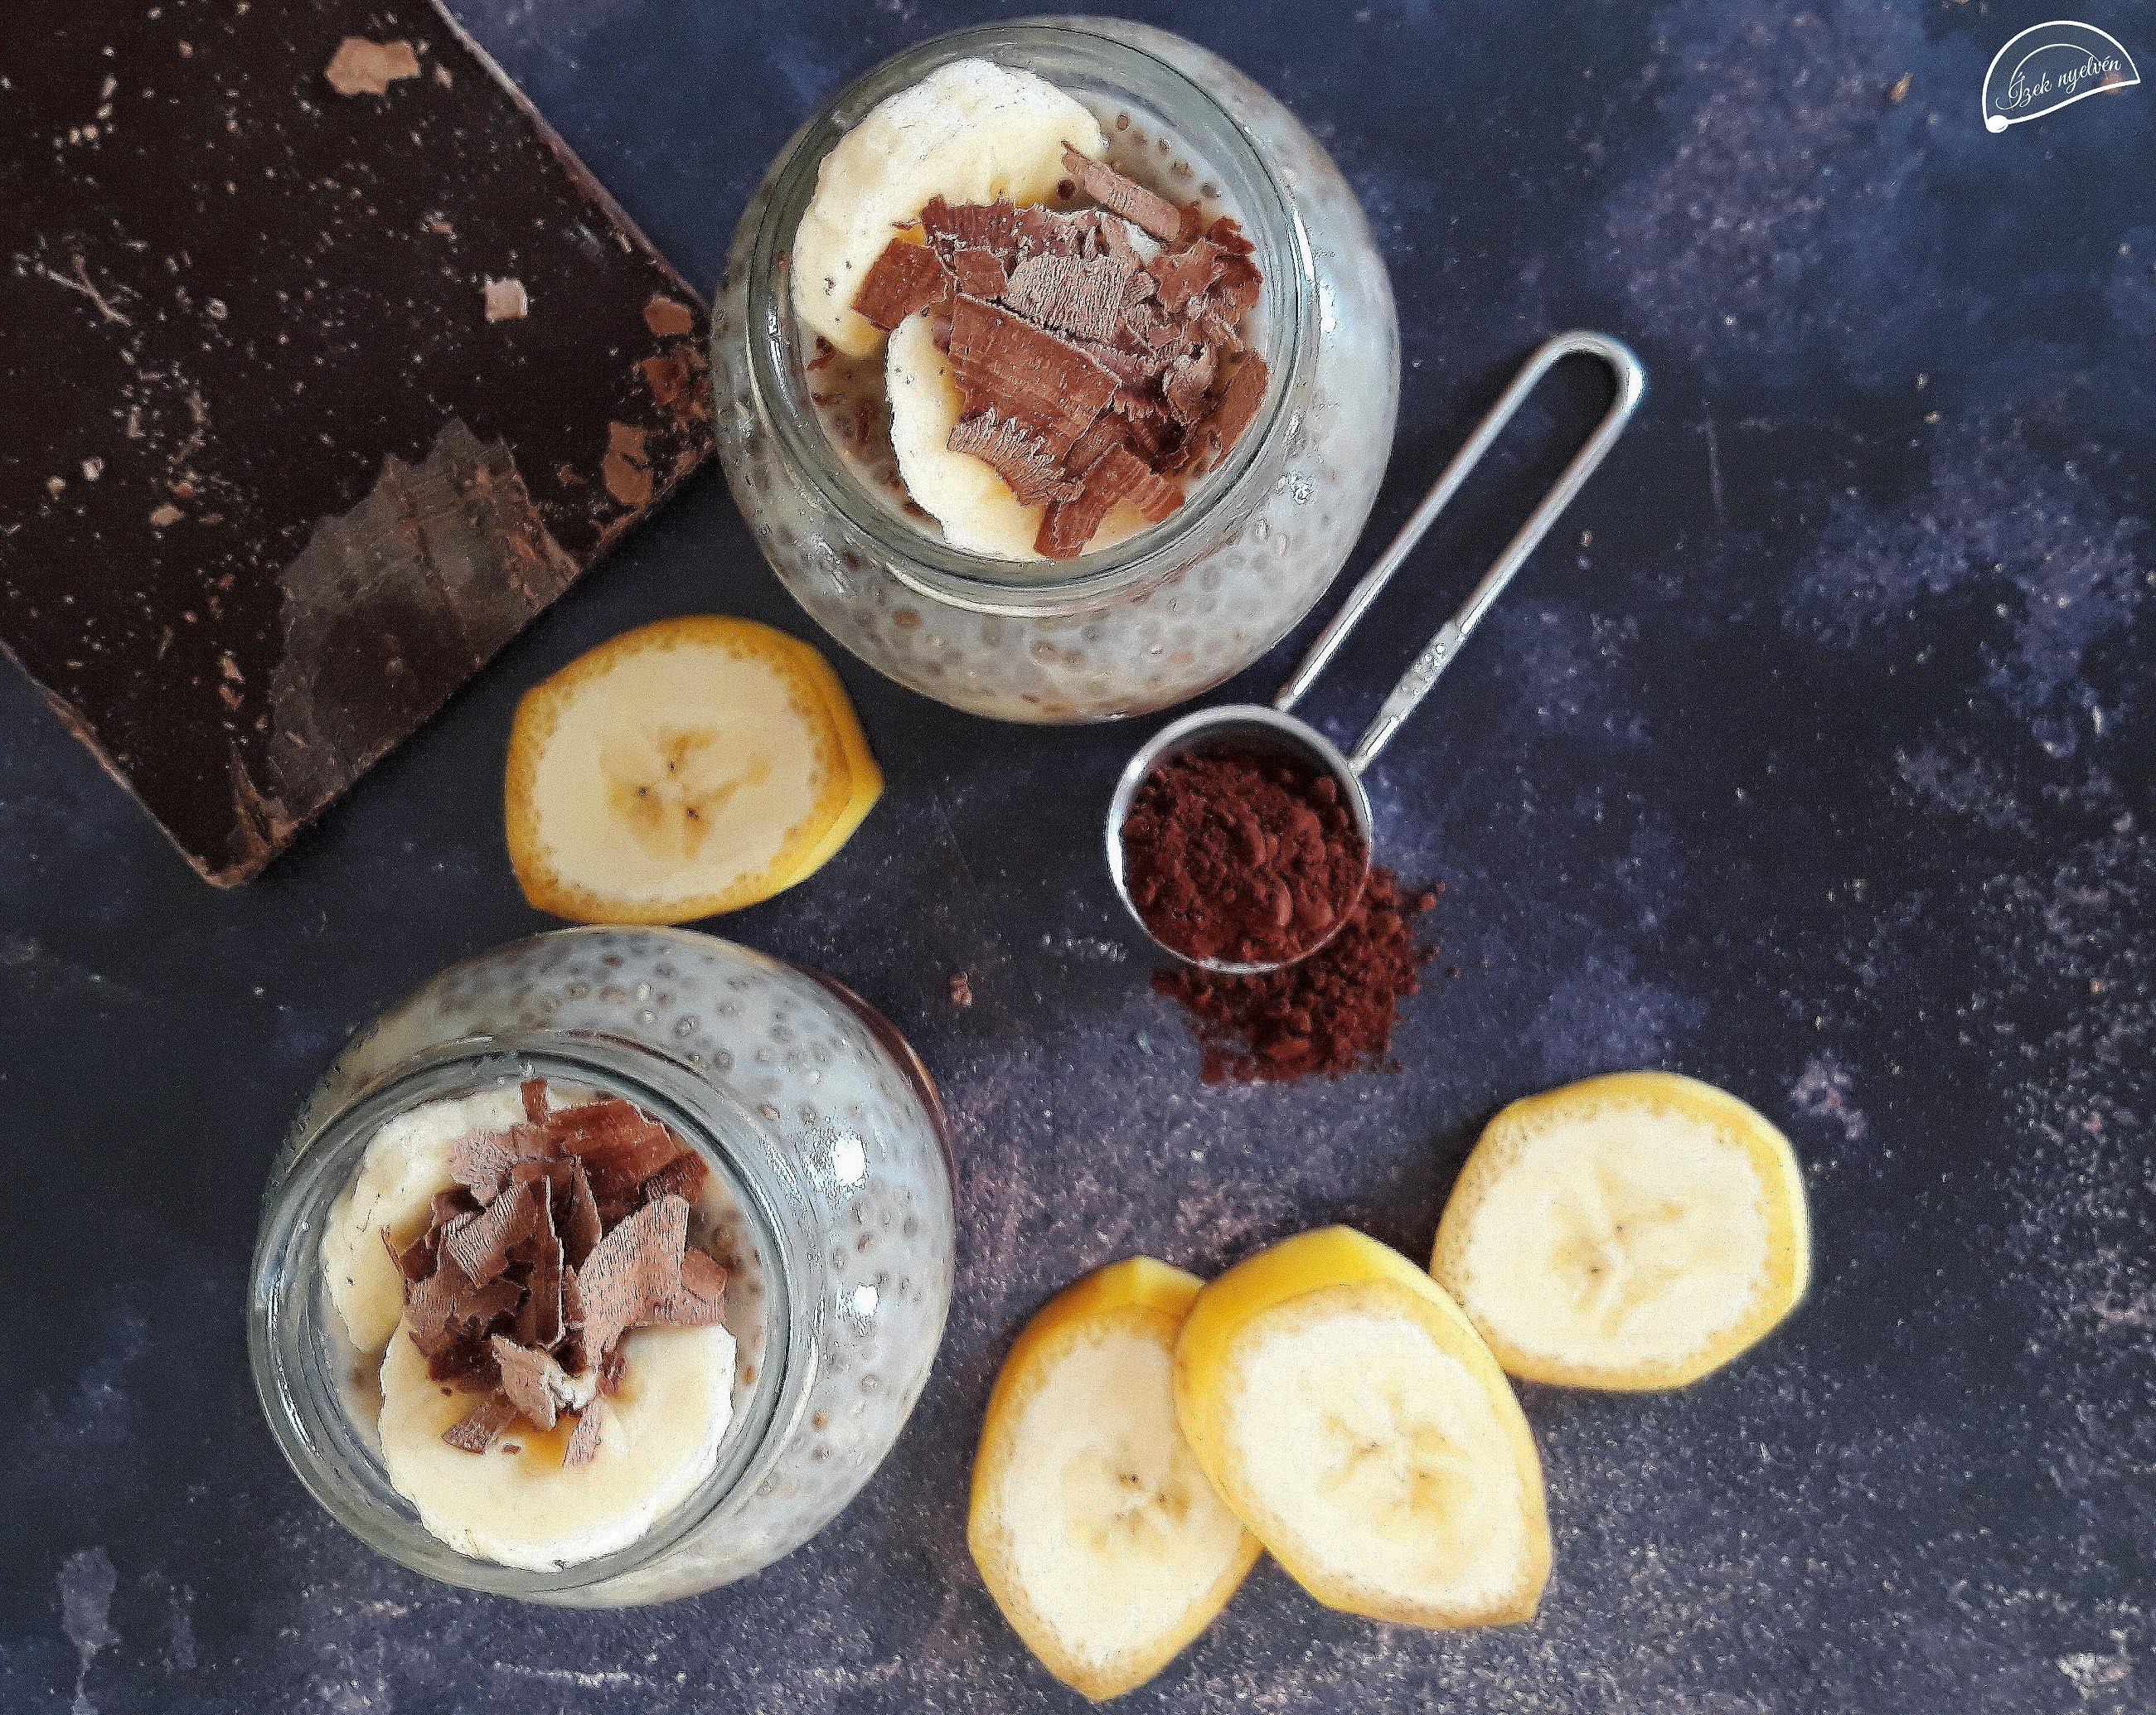 csokis-bananos_chia_puding2.jpg